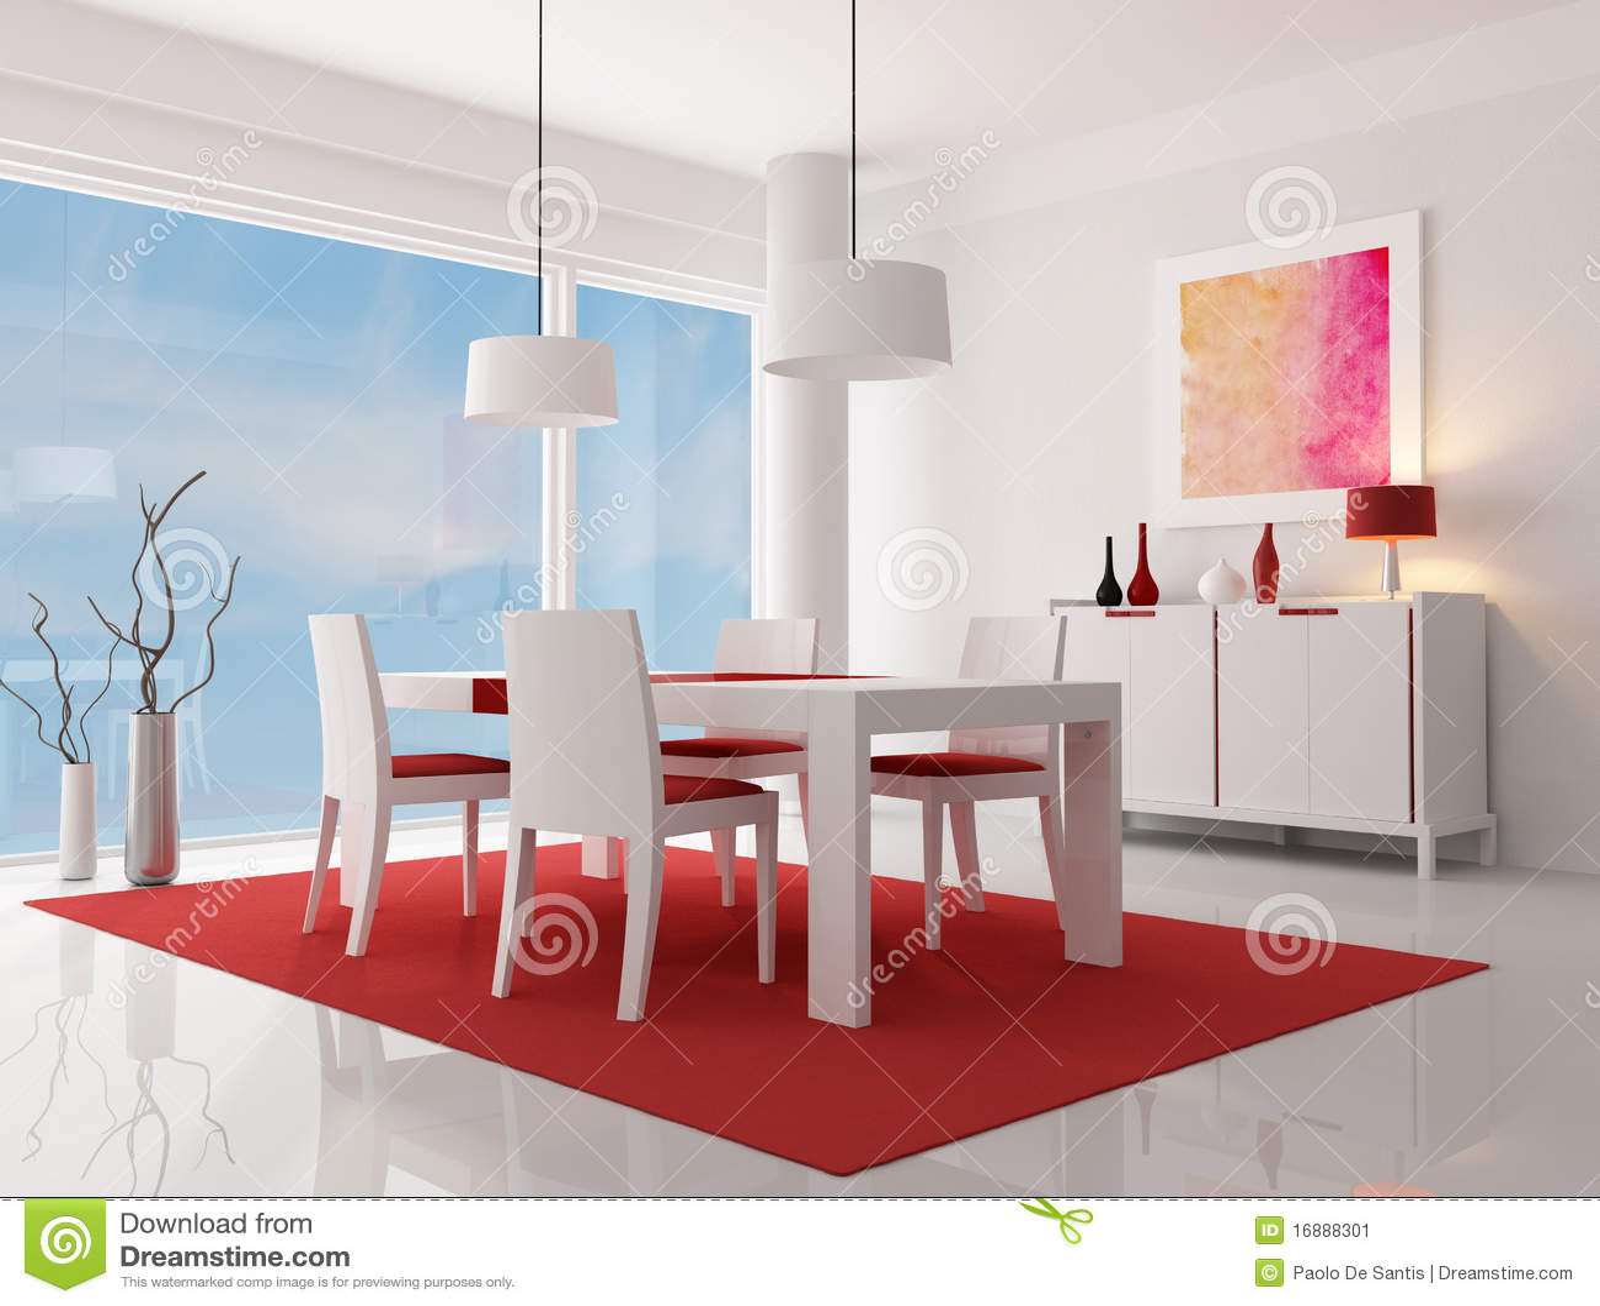 La Sala Da Pranzo Moderna Bianca E Rossa Rappresentazione L'opera  #B01B54 1300 1078 Sala Da Pranzo Modello Regina